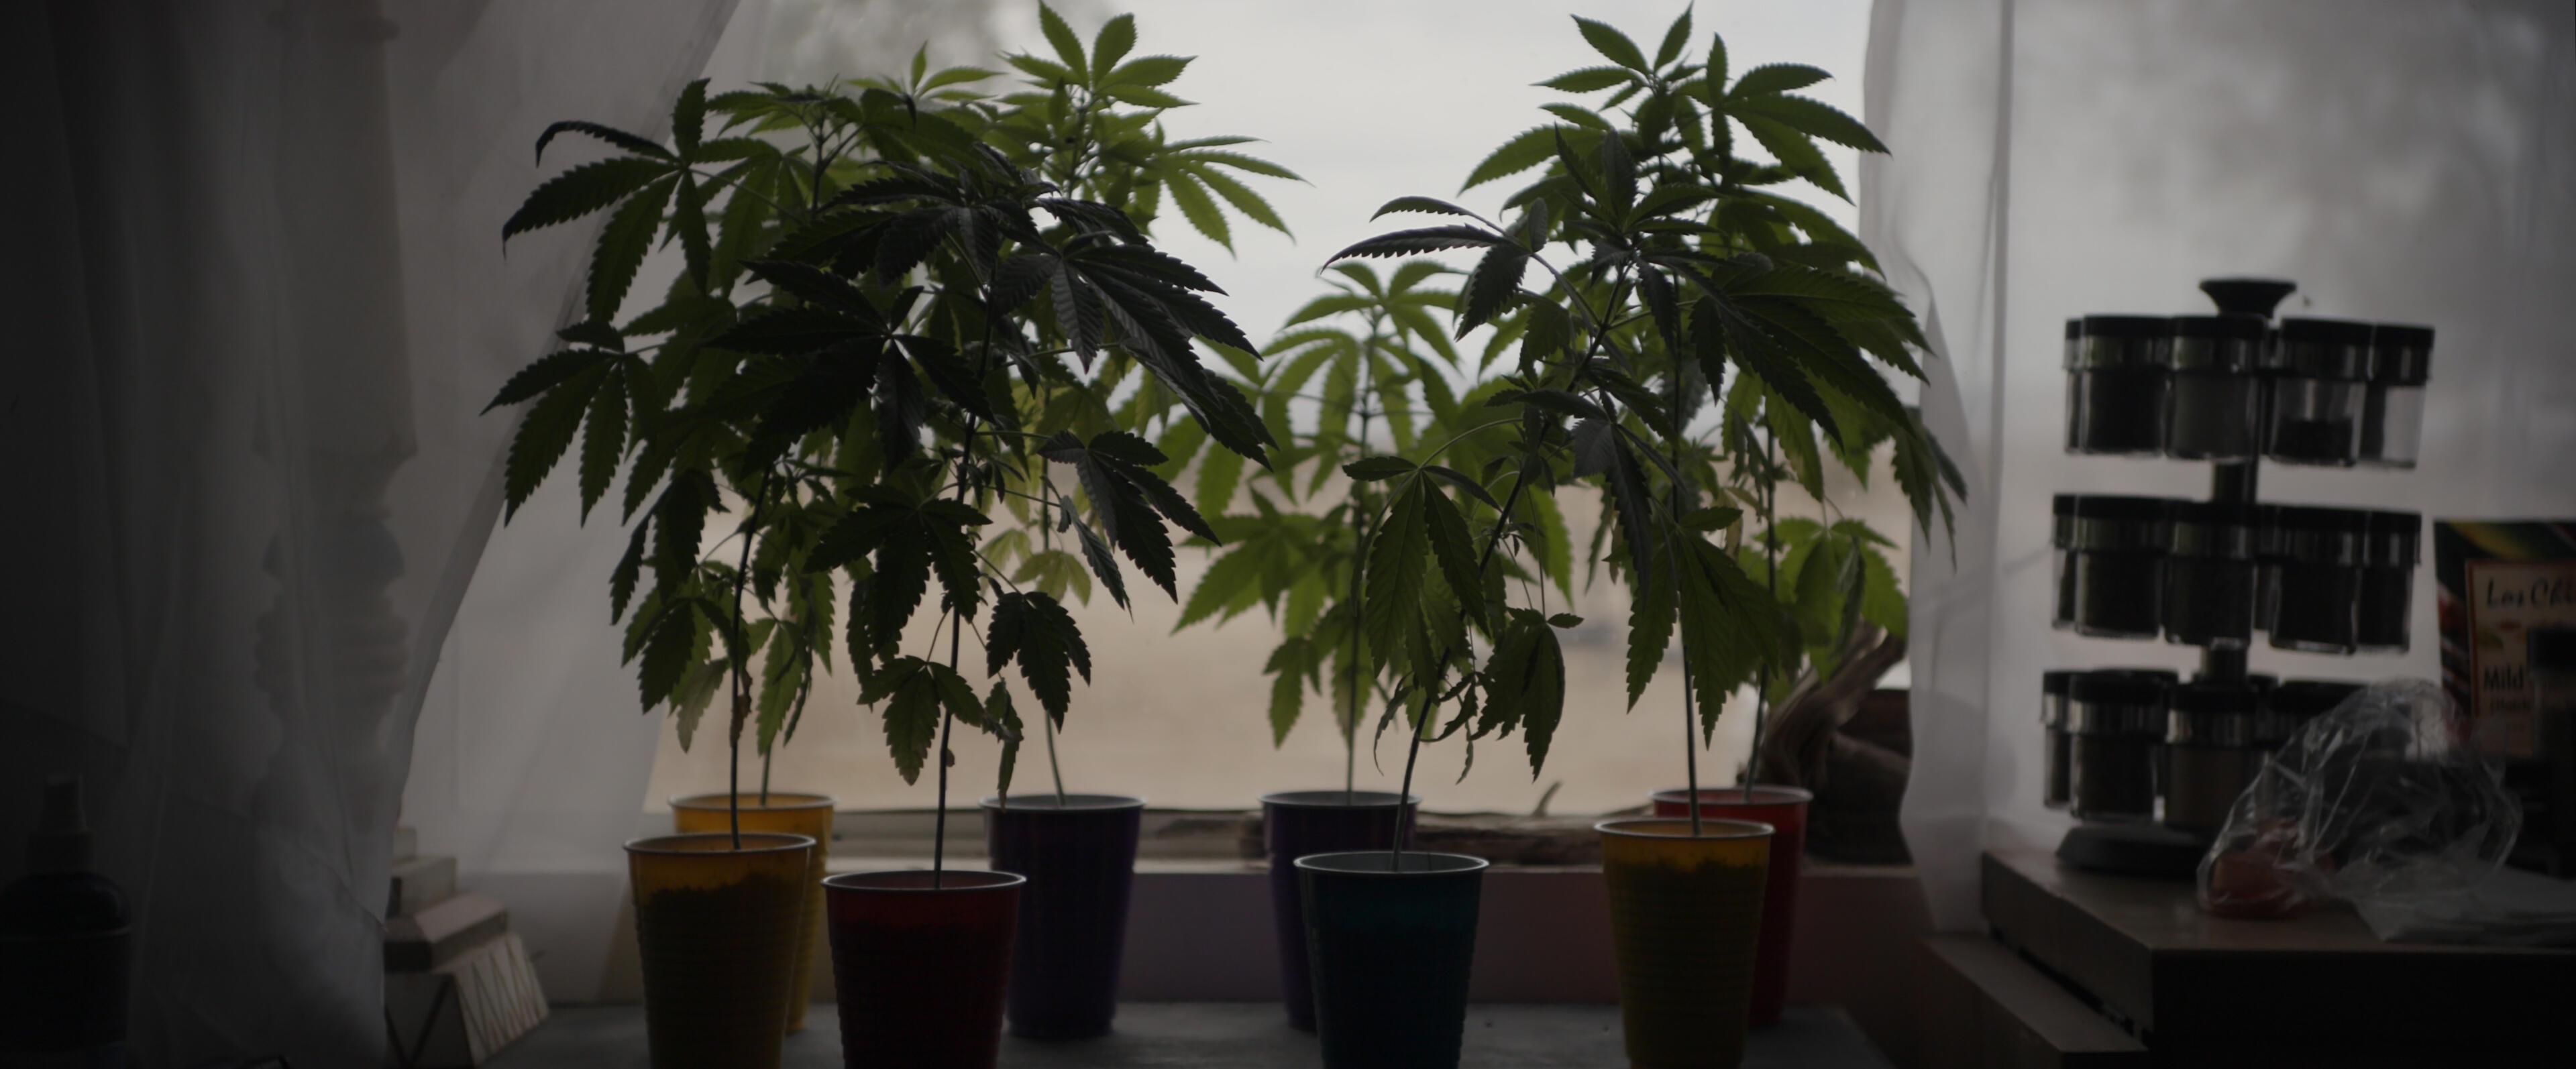 Cannabis plants in a still from 'Sasquatch'